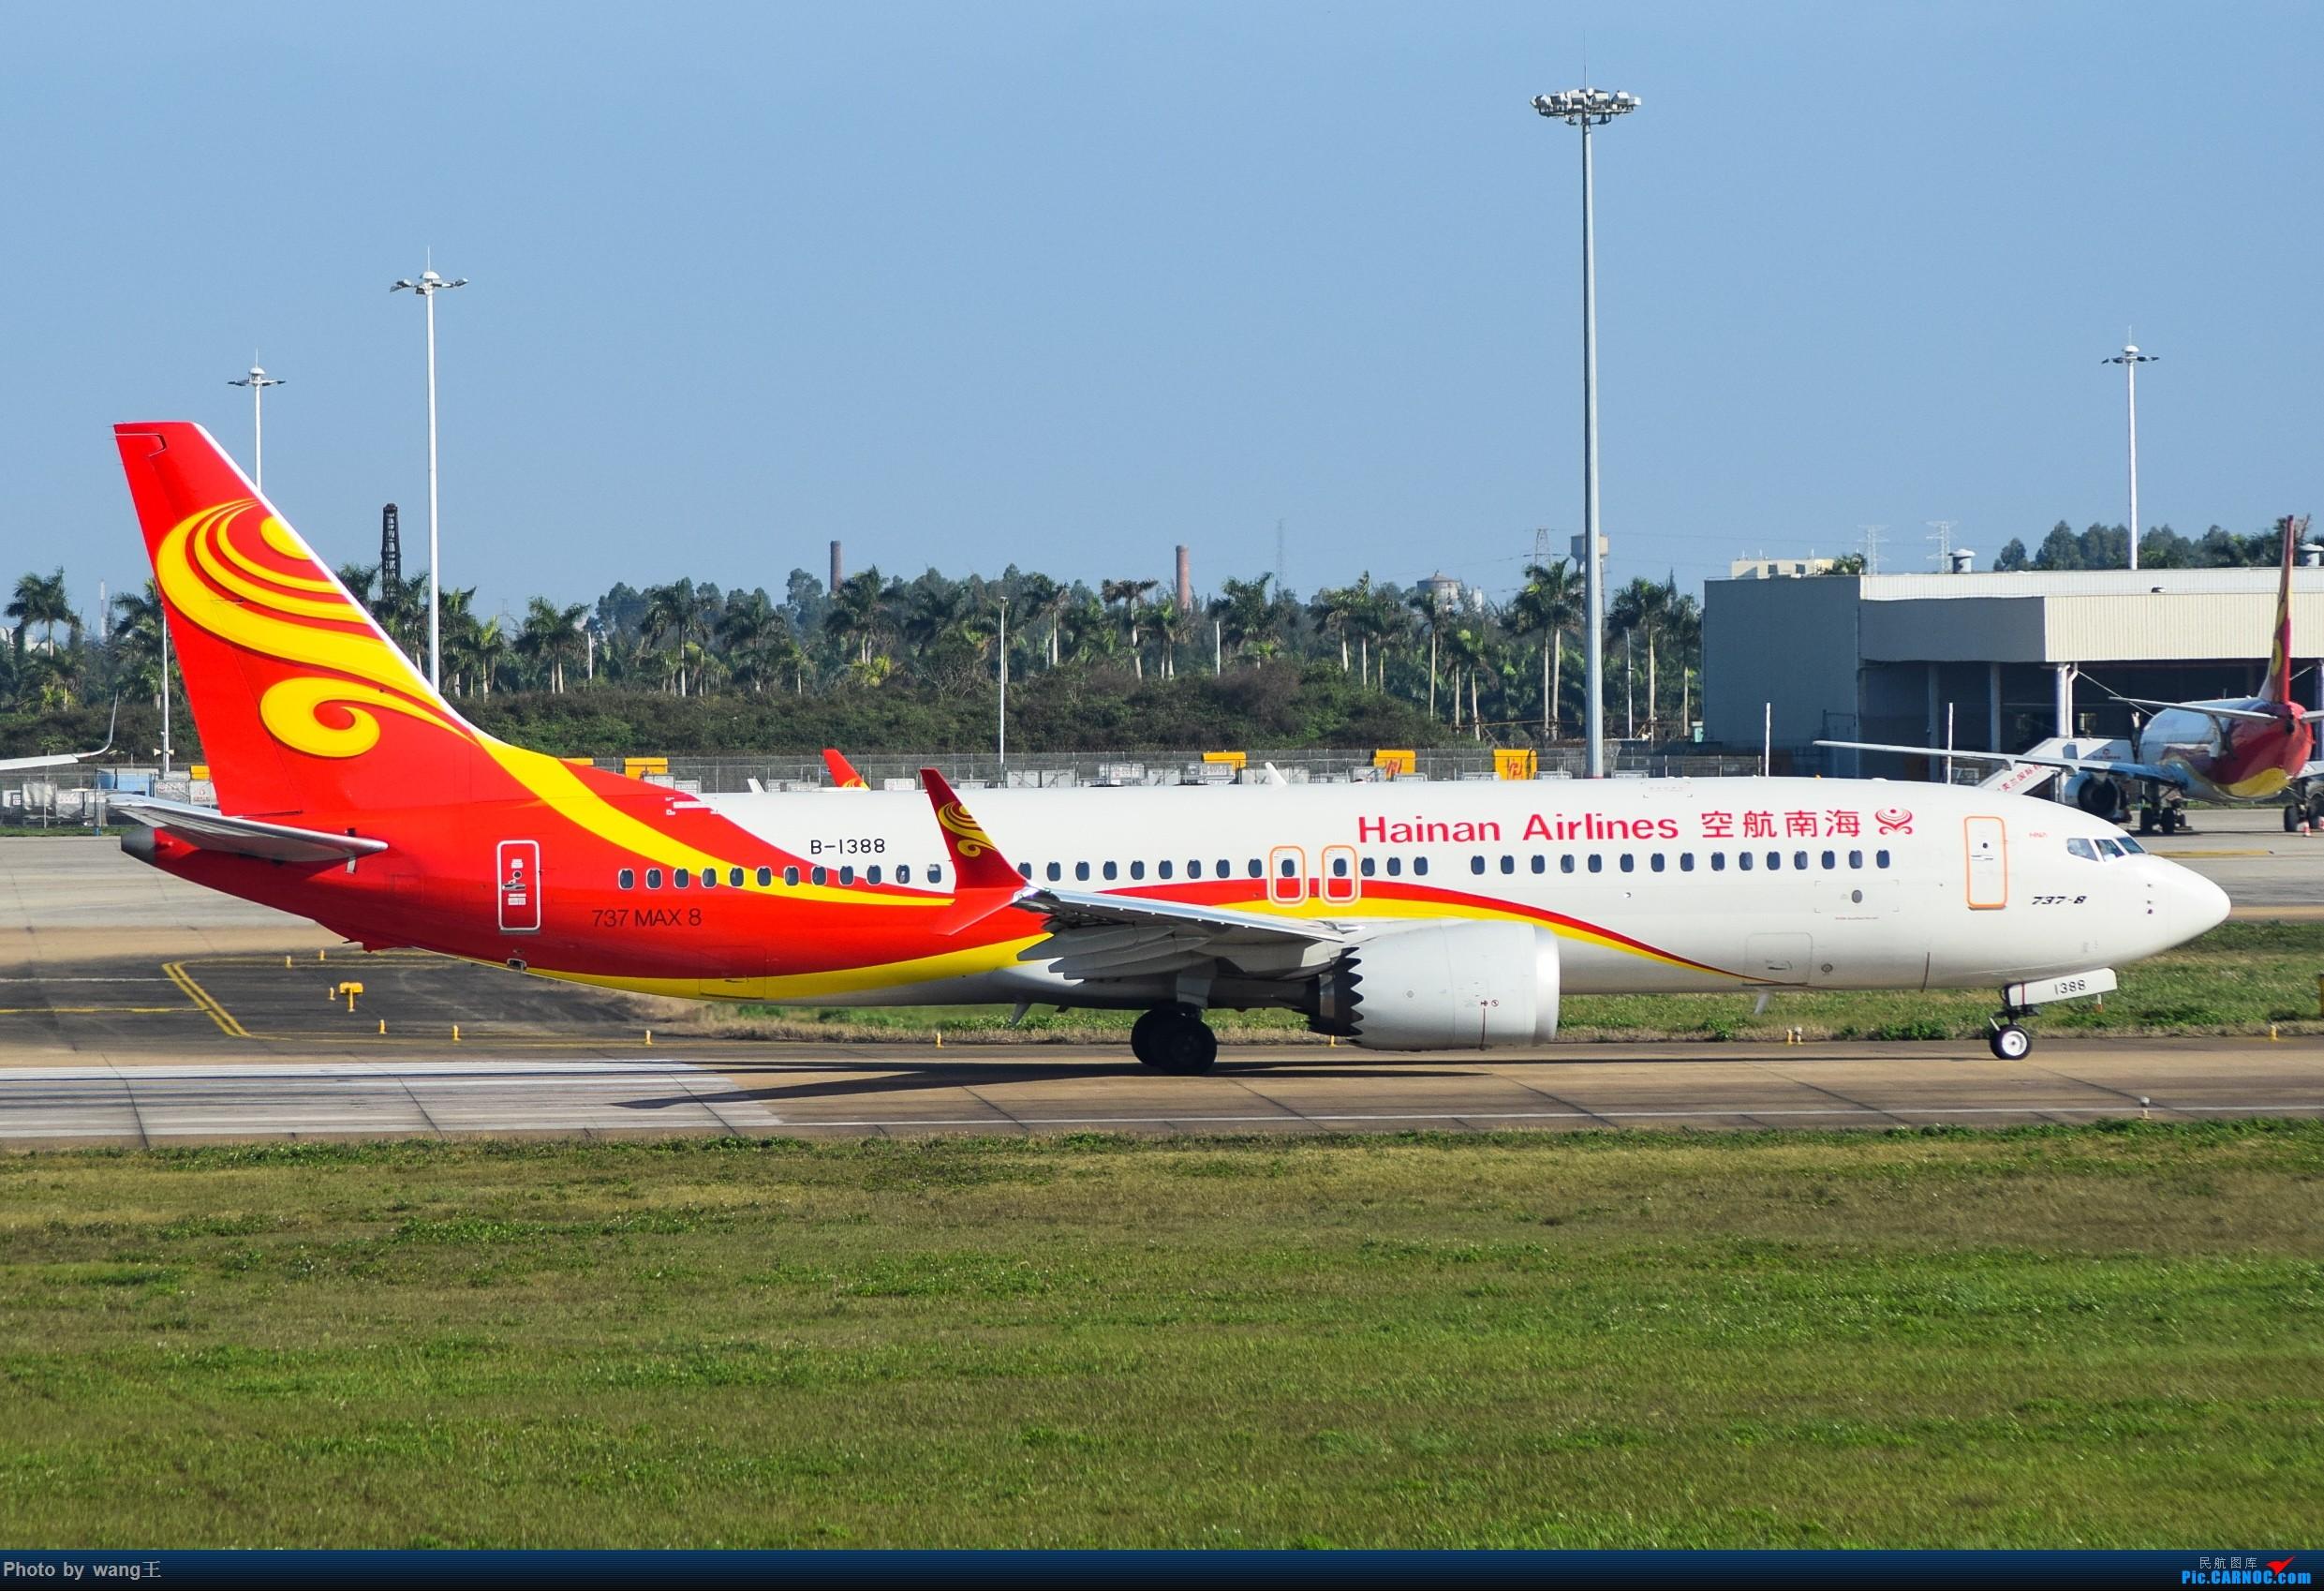 Re:[原创]记录HAK 2019的春运 BOEING 737MAX-8 B-1388 中国海口美兰国际机场